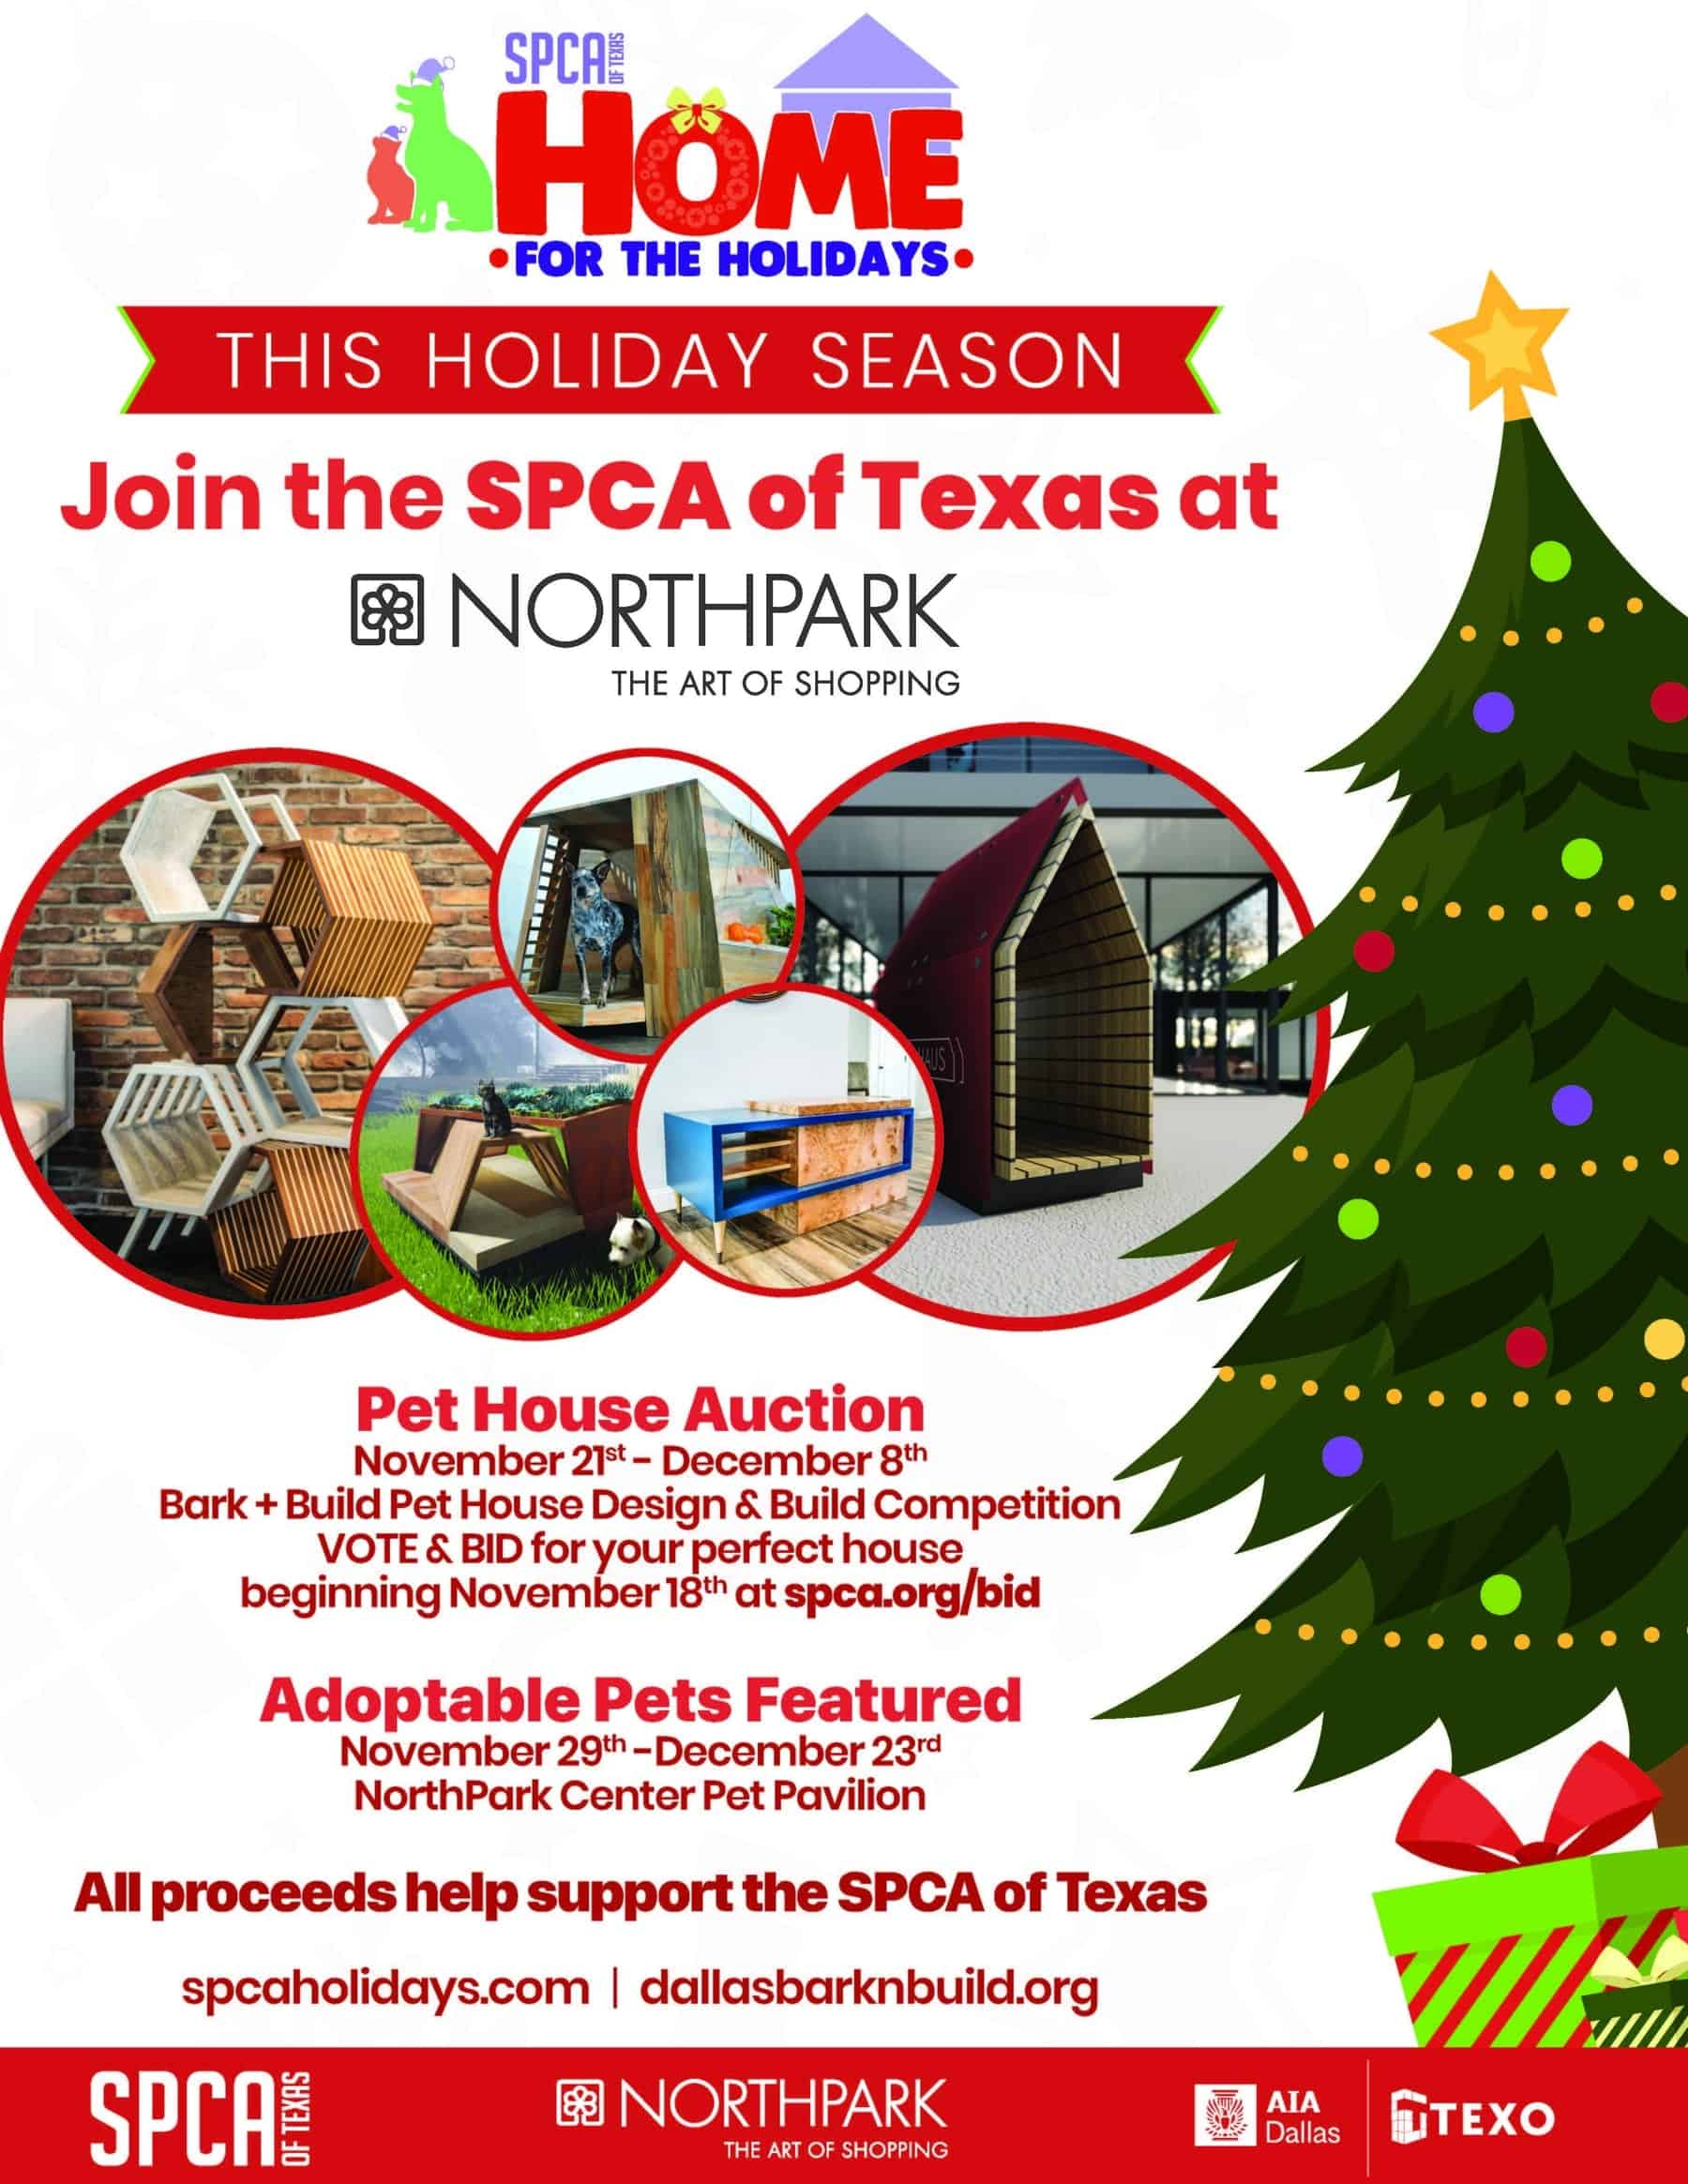 bark and build aia dallas event information